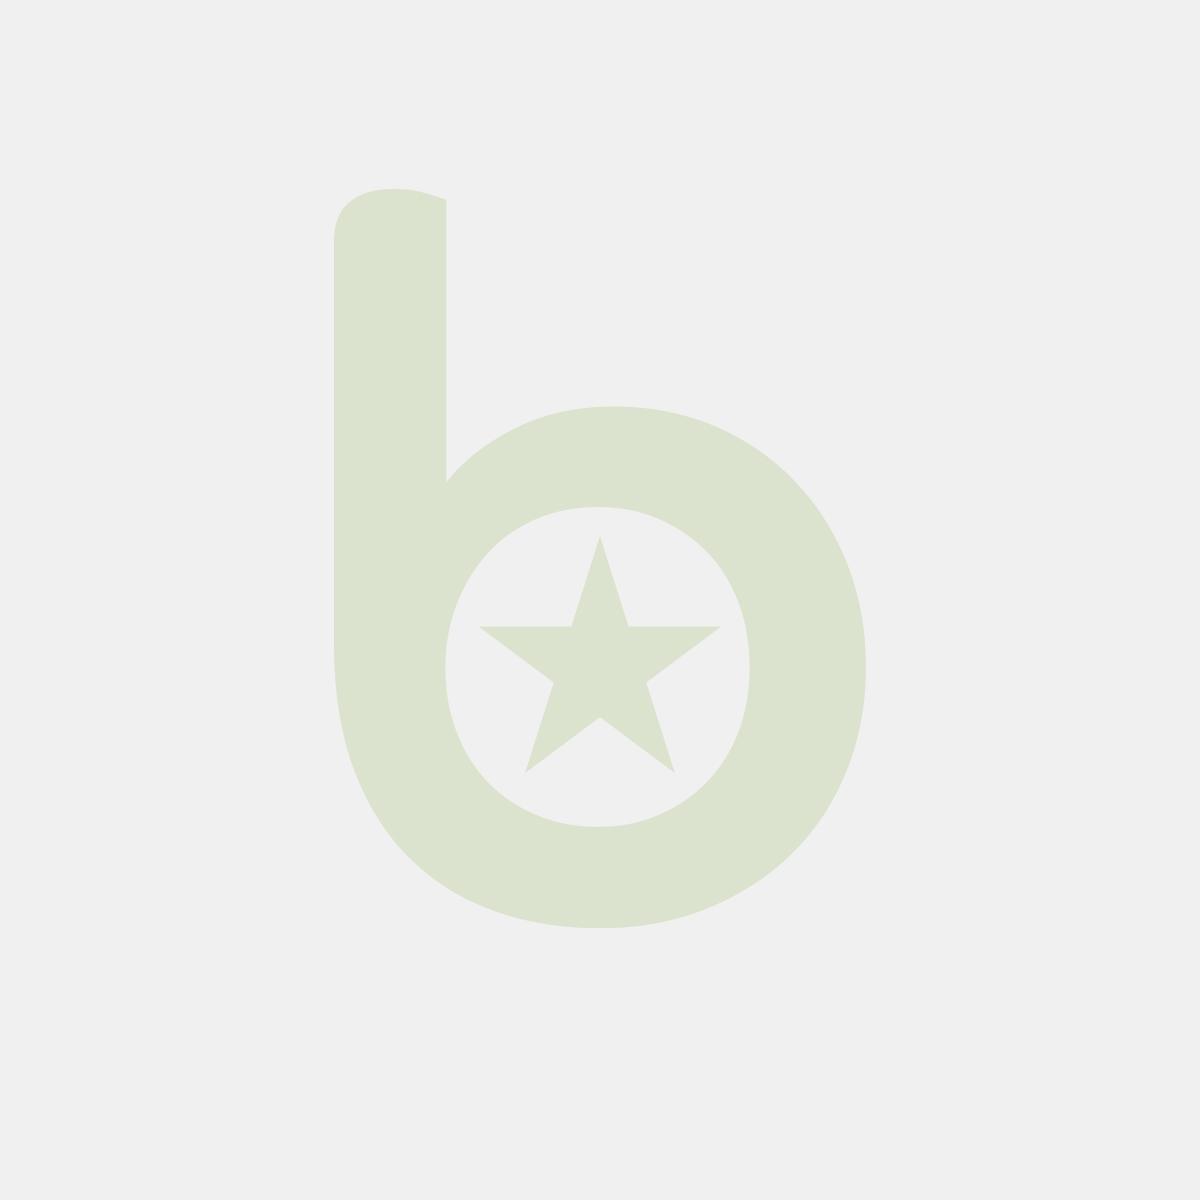 Patyczki 12cm GOLF op. 250szt - FINGERFOOD